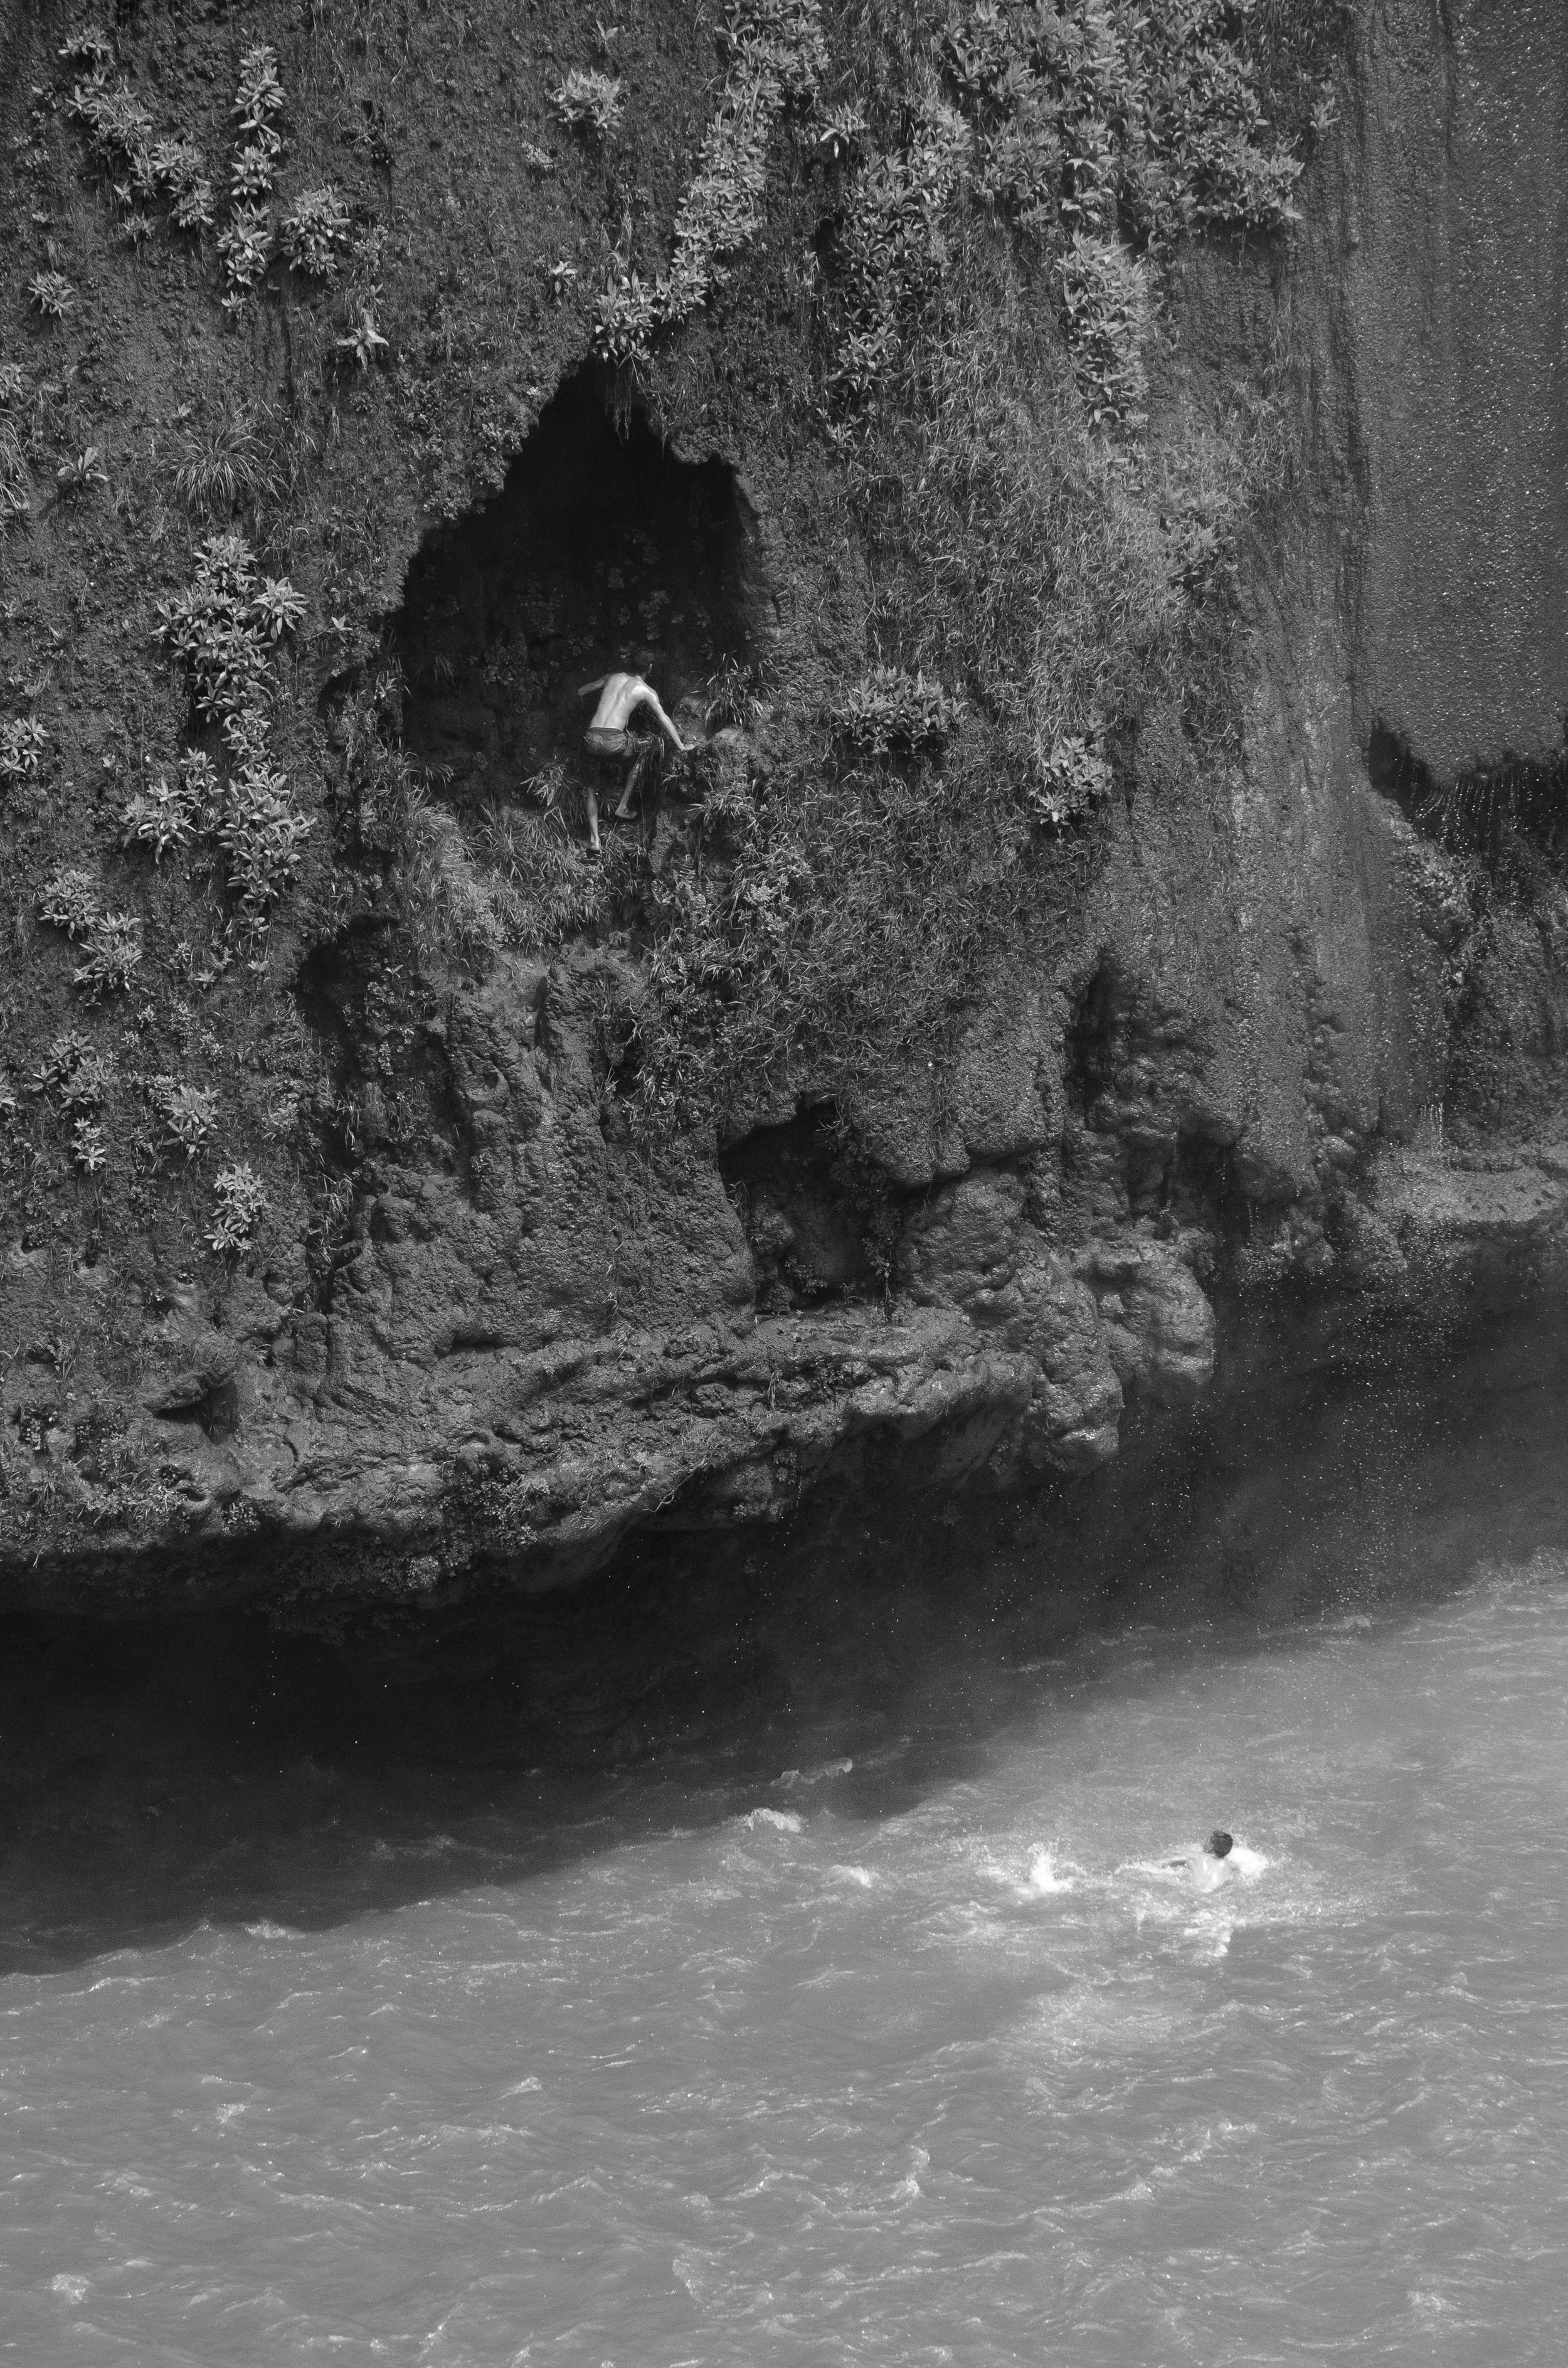 waterfalls_01.jpg